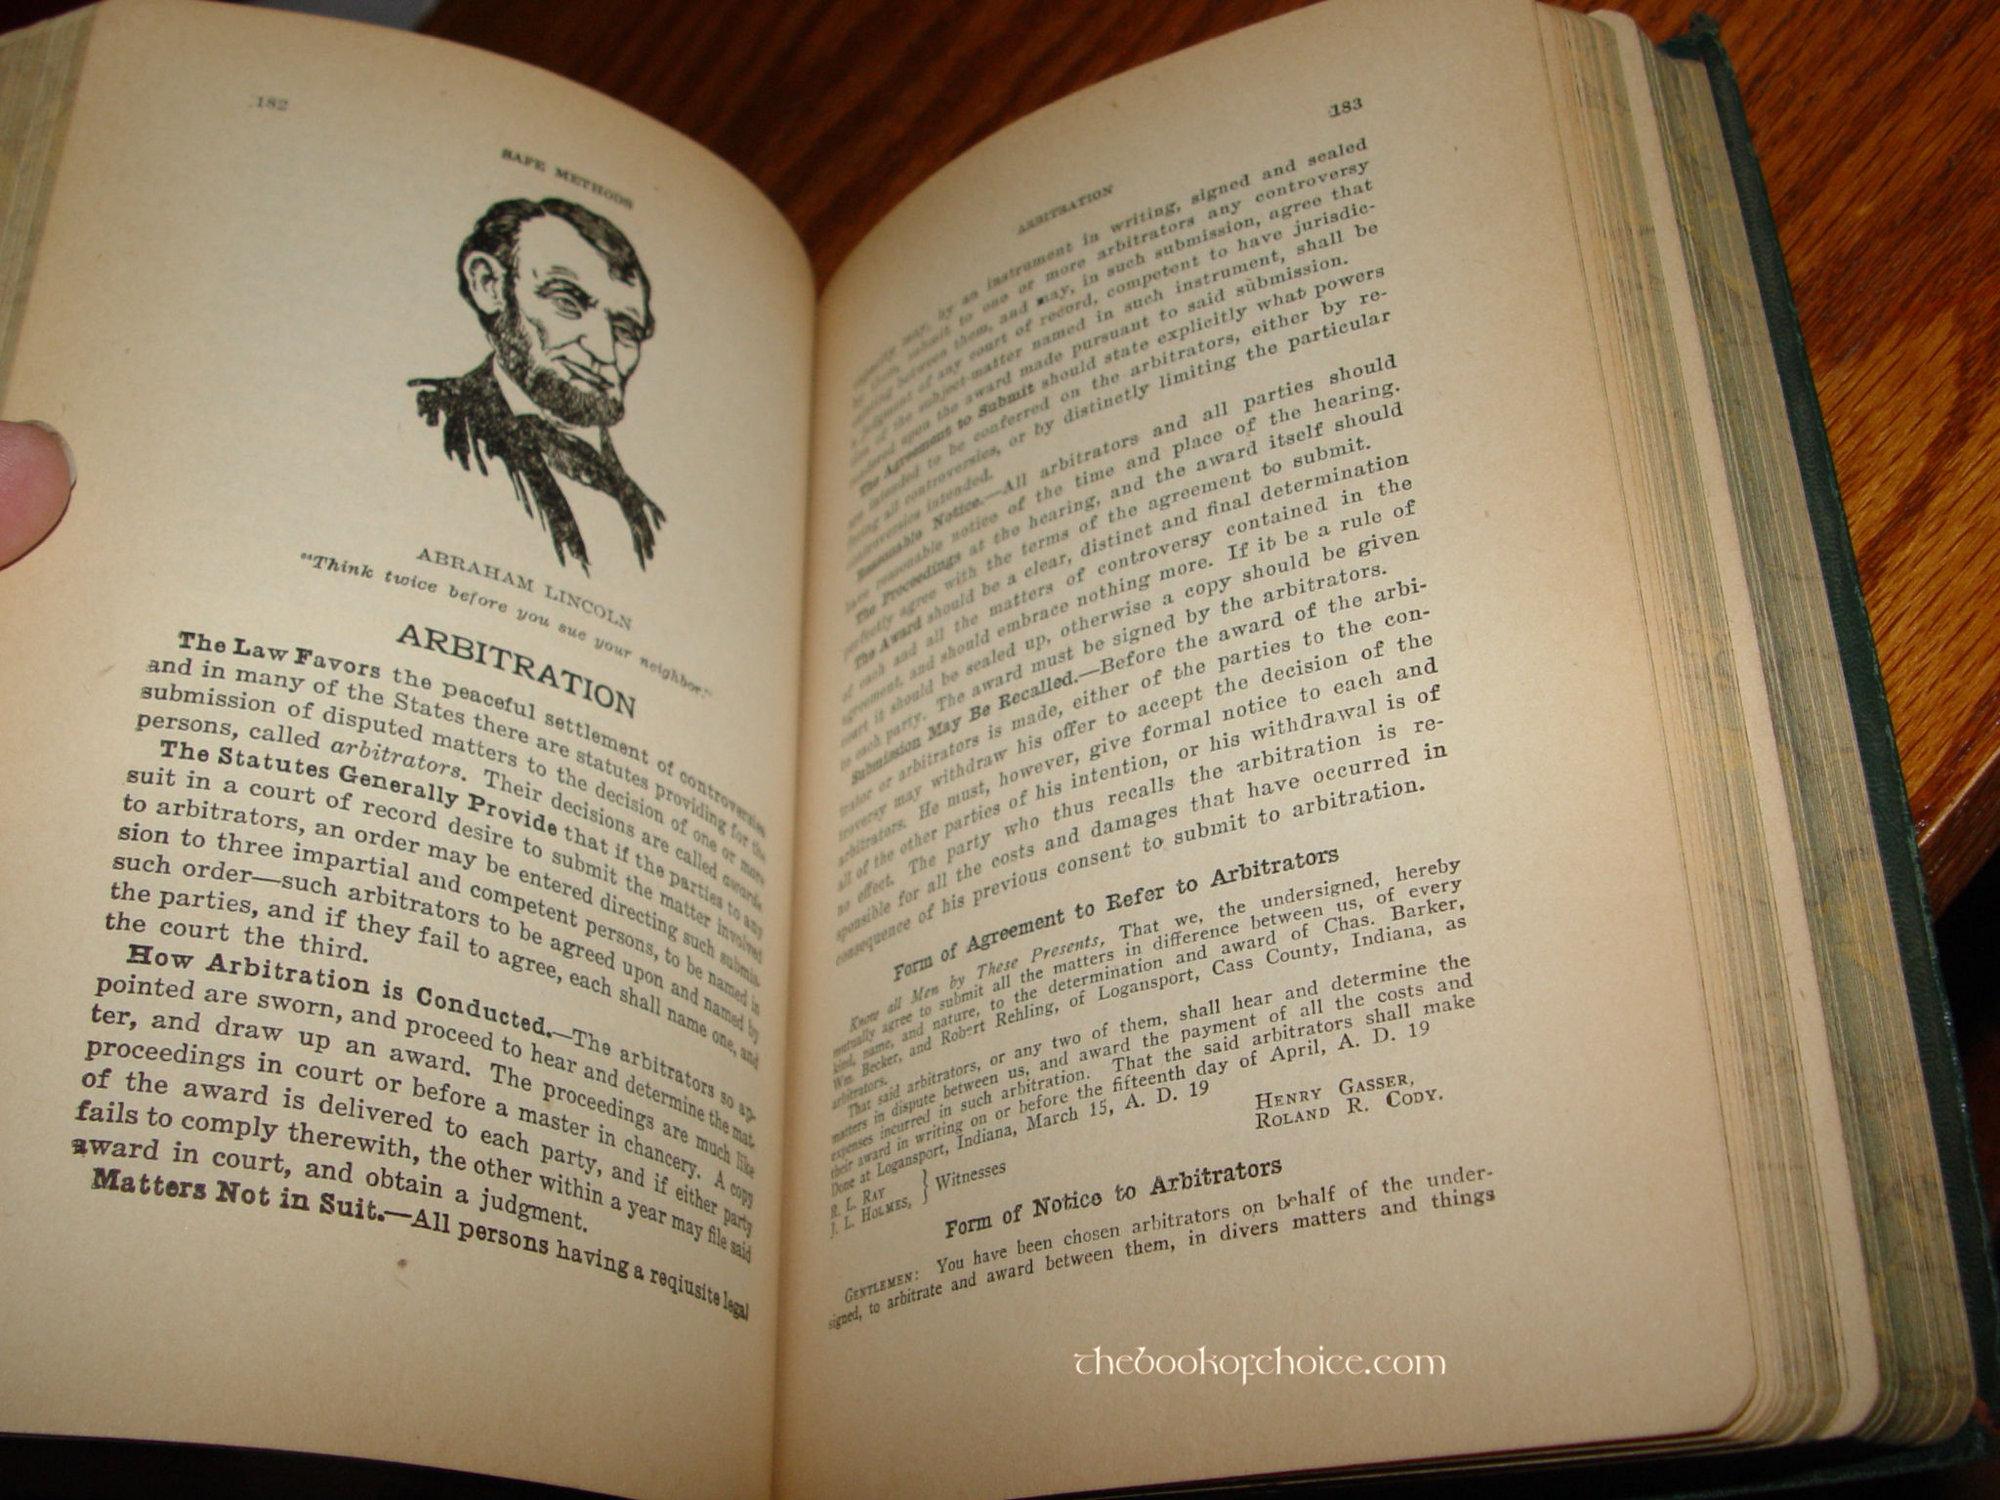 A History of Minnesota Vol                                         II - by William Watts Folwell;                                         Folwell, William Watts,                                         1833-1929